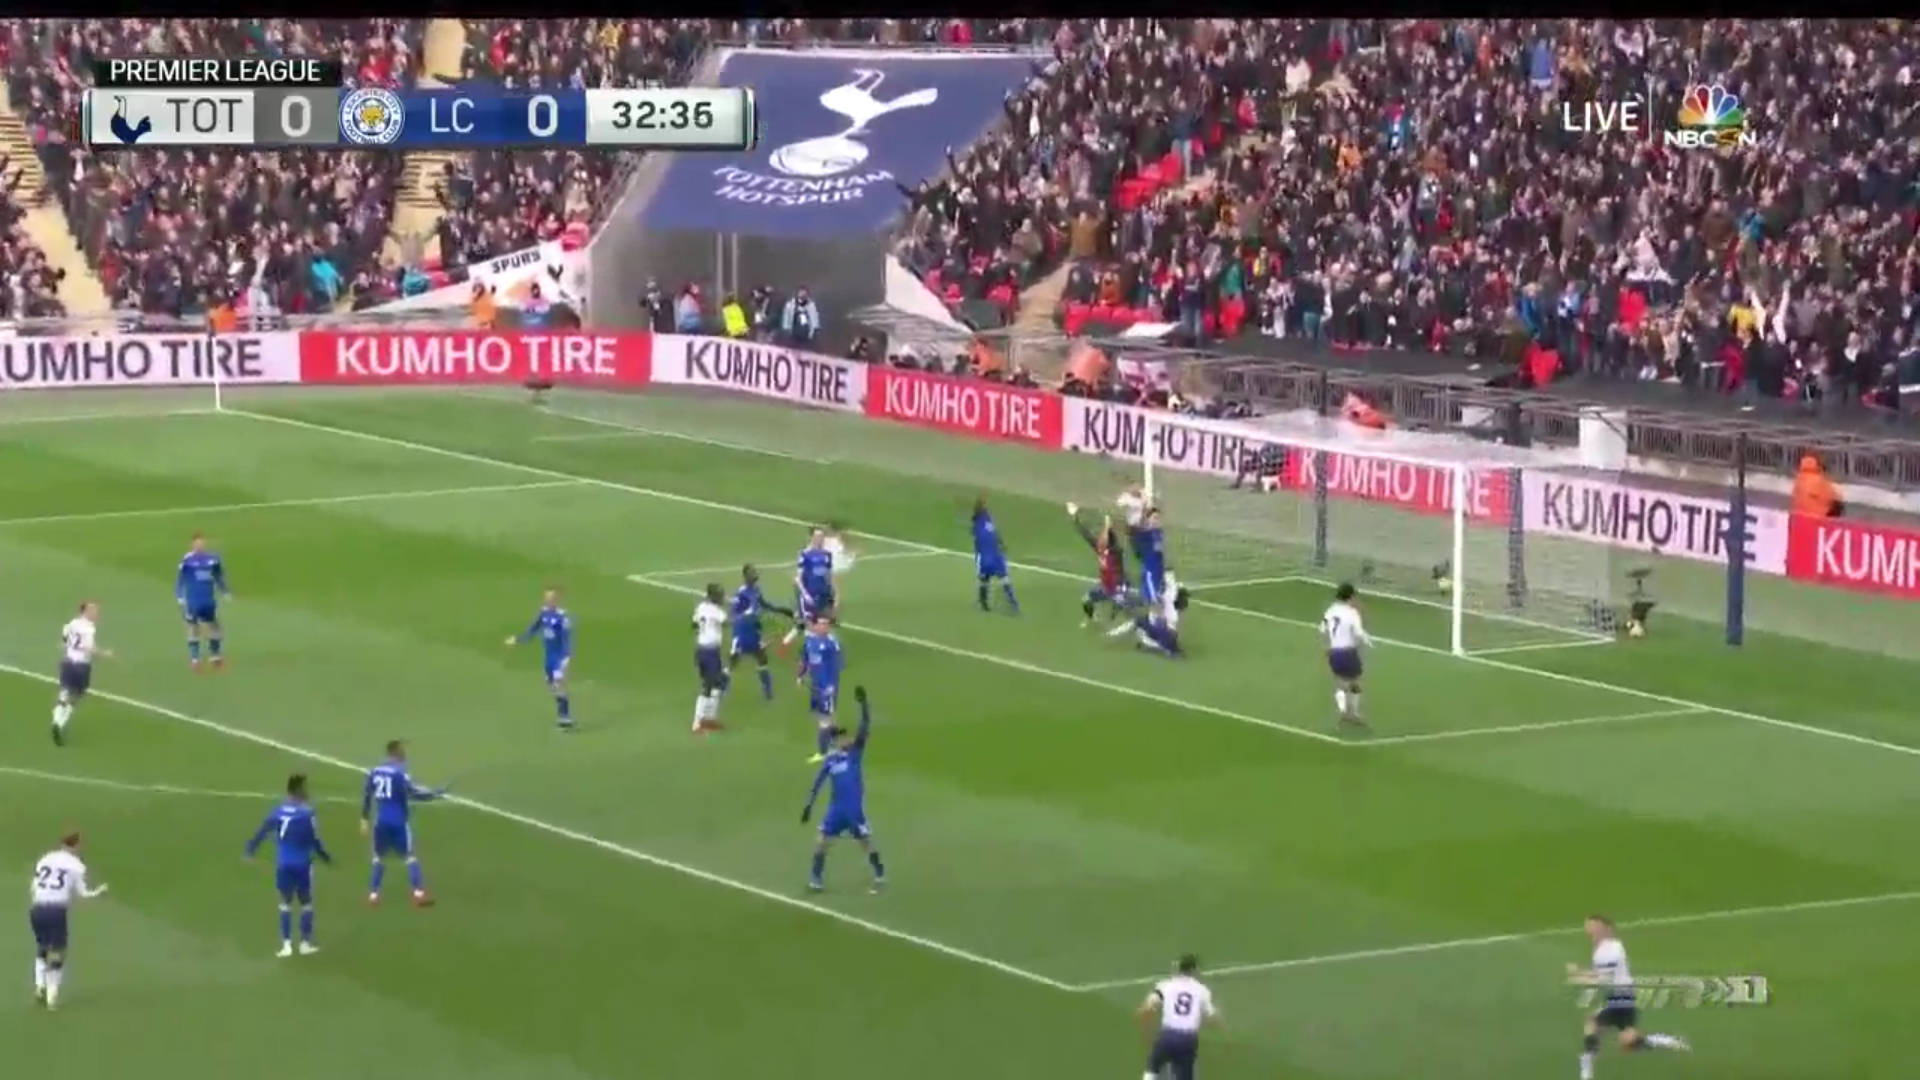 10-02-2019 - Tottenham Hotspur 3-1 Leicester City